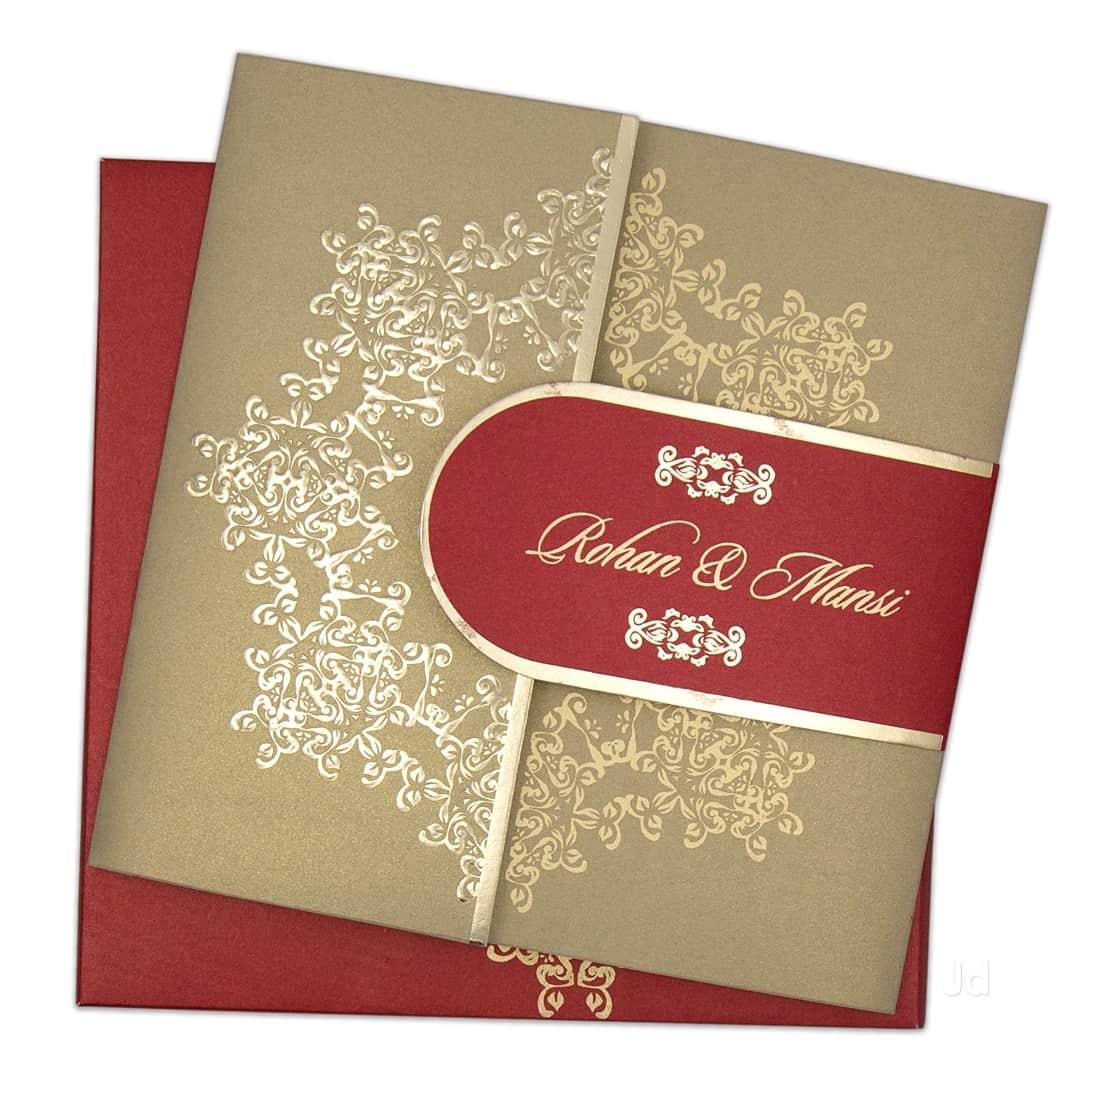 Vowsy Invites, Ramesh Nagar - Wedding Card Printers in Delhi - Justdial